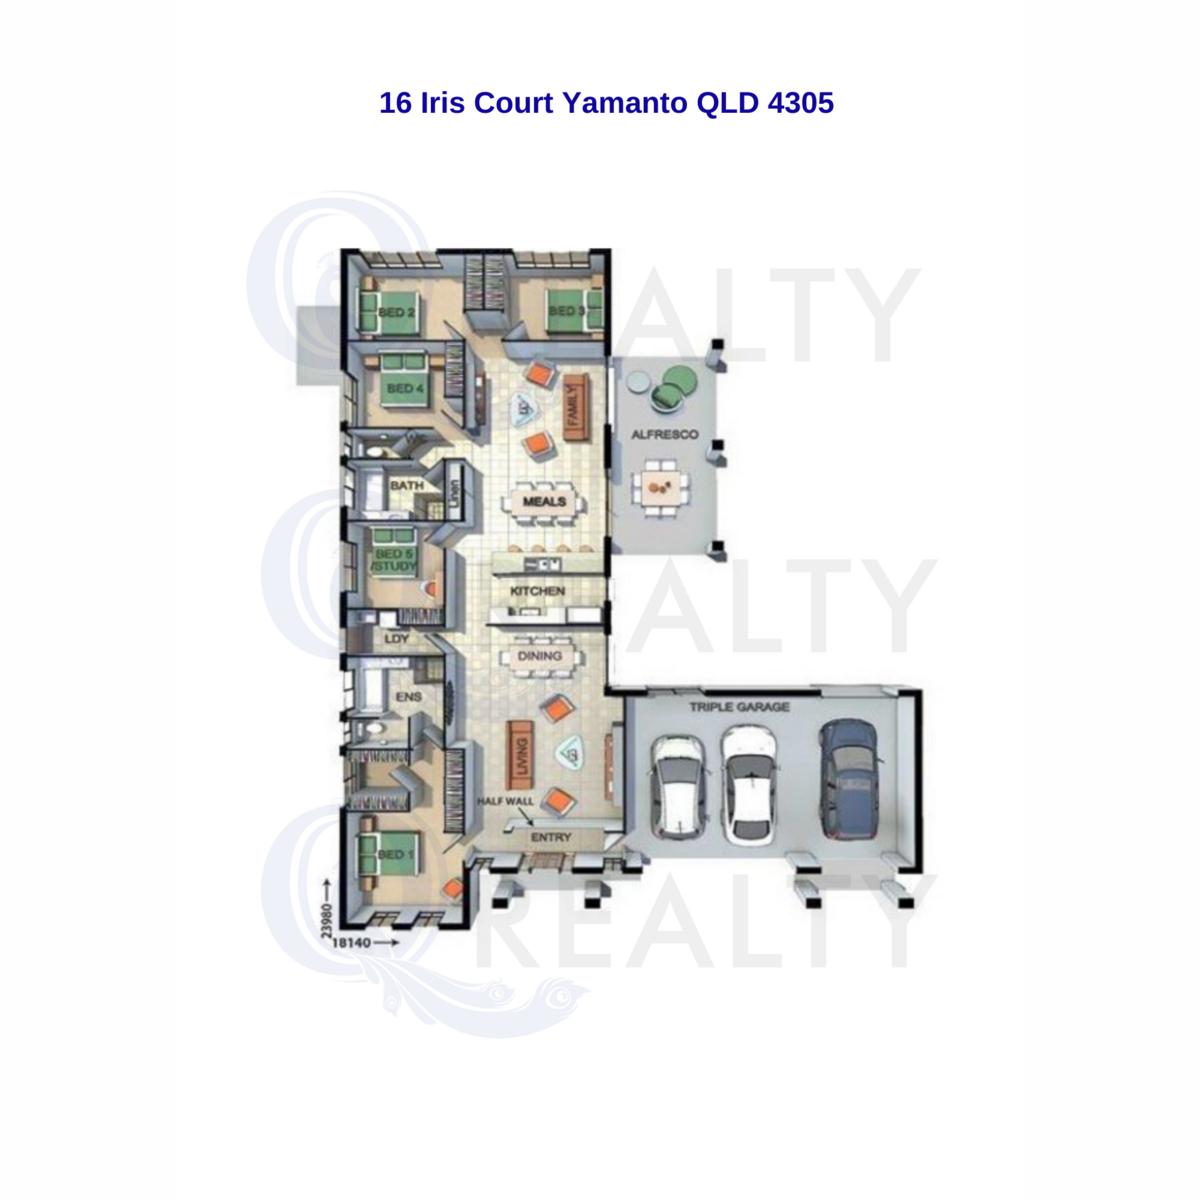 16 Iris Court, Yamanto  QLD  4305